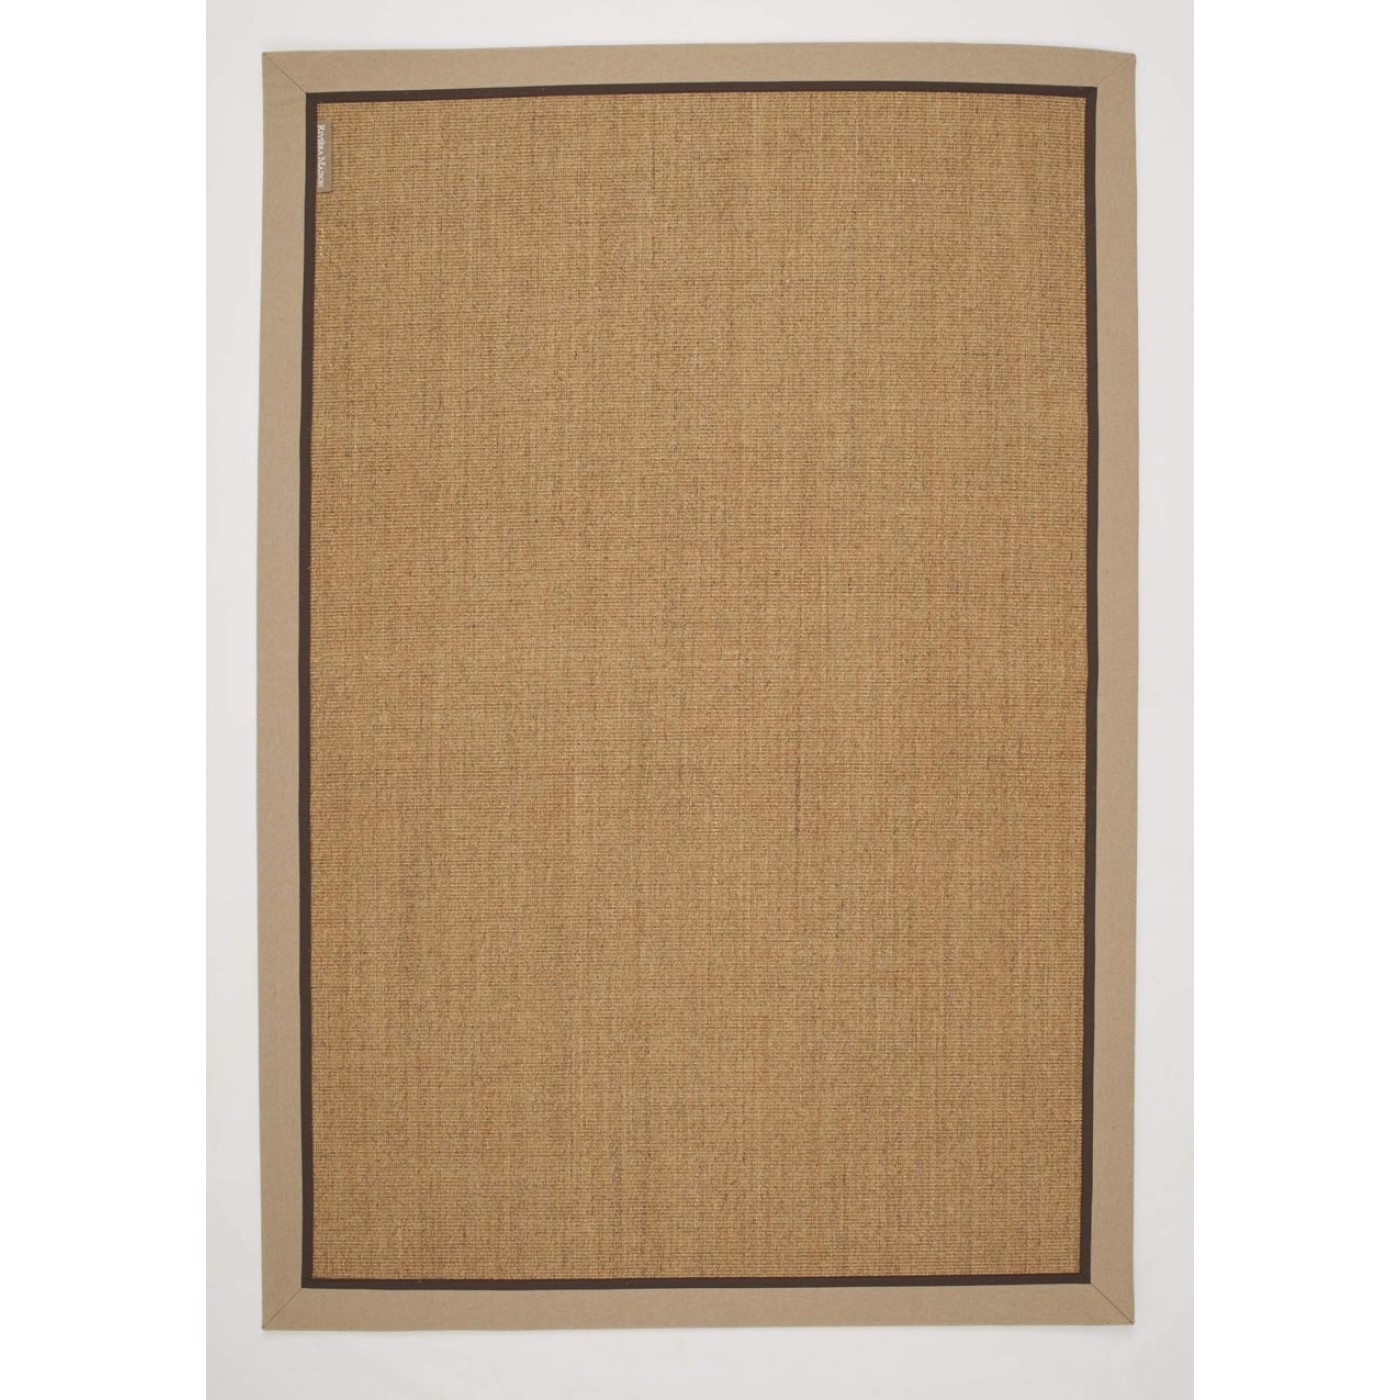 Edgartown Carpet Riviera Maison 15 RM 12